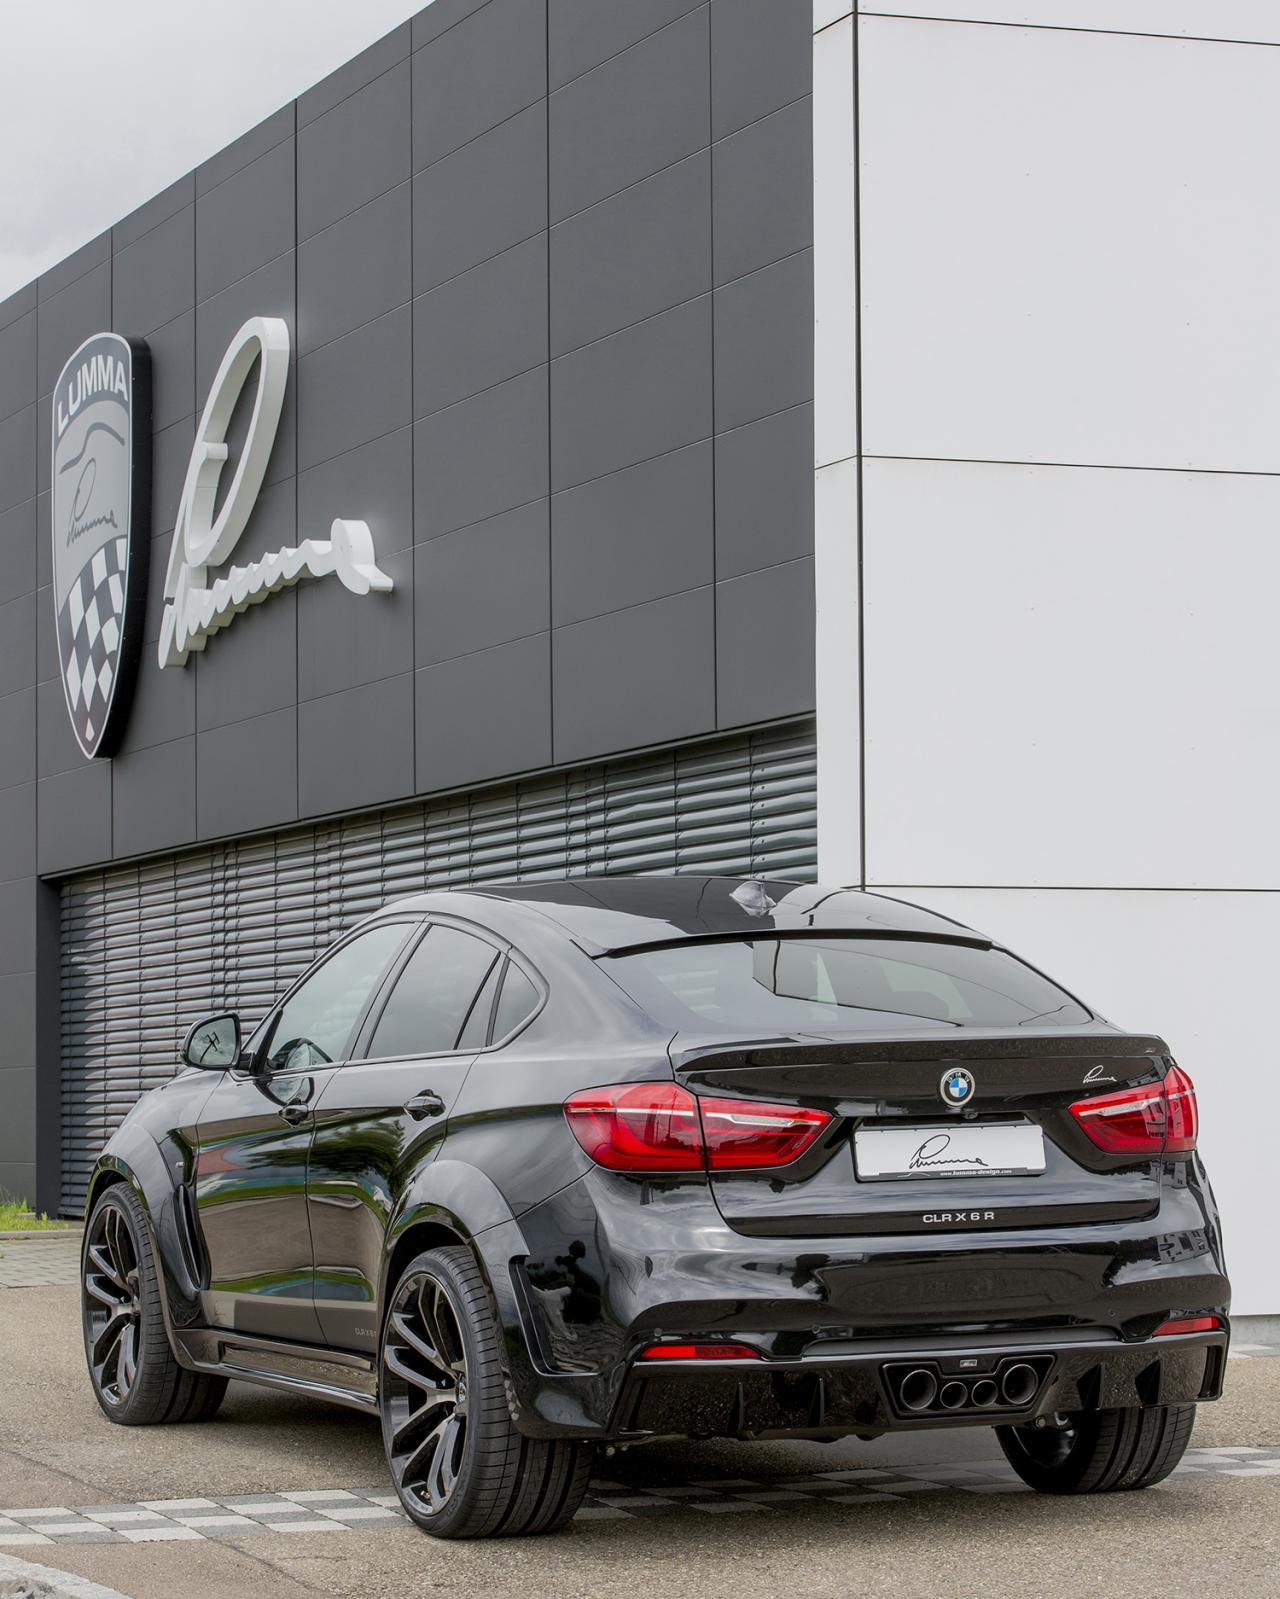 Bmw X6 Tuned: BMW X6 Tuned Up By LUMMA Design